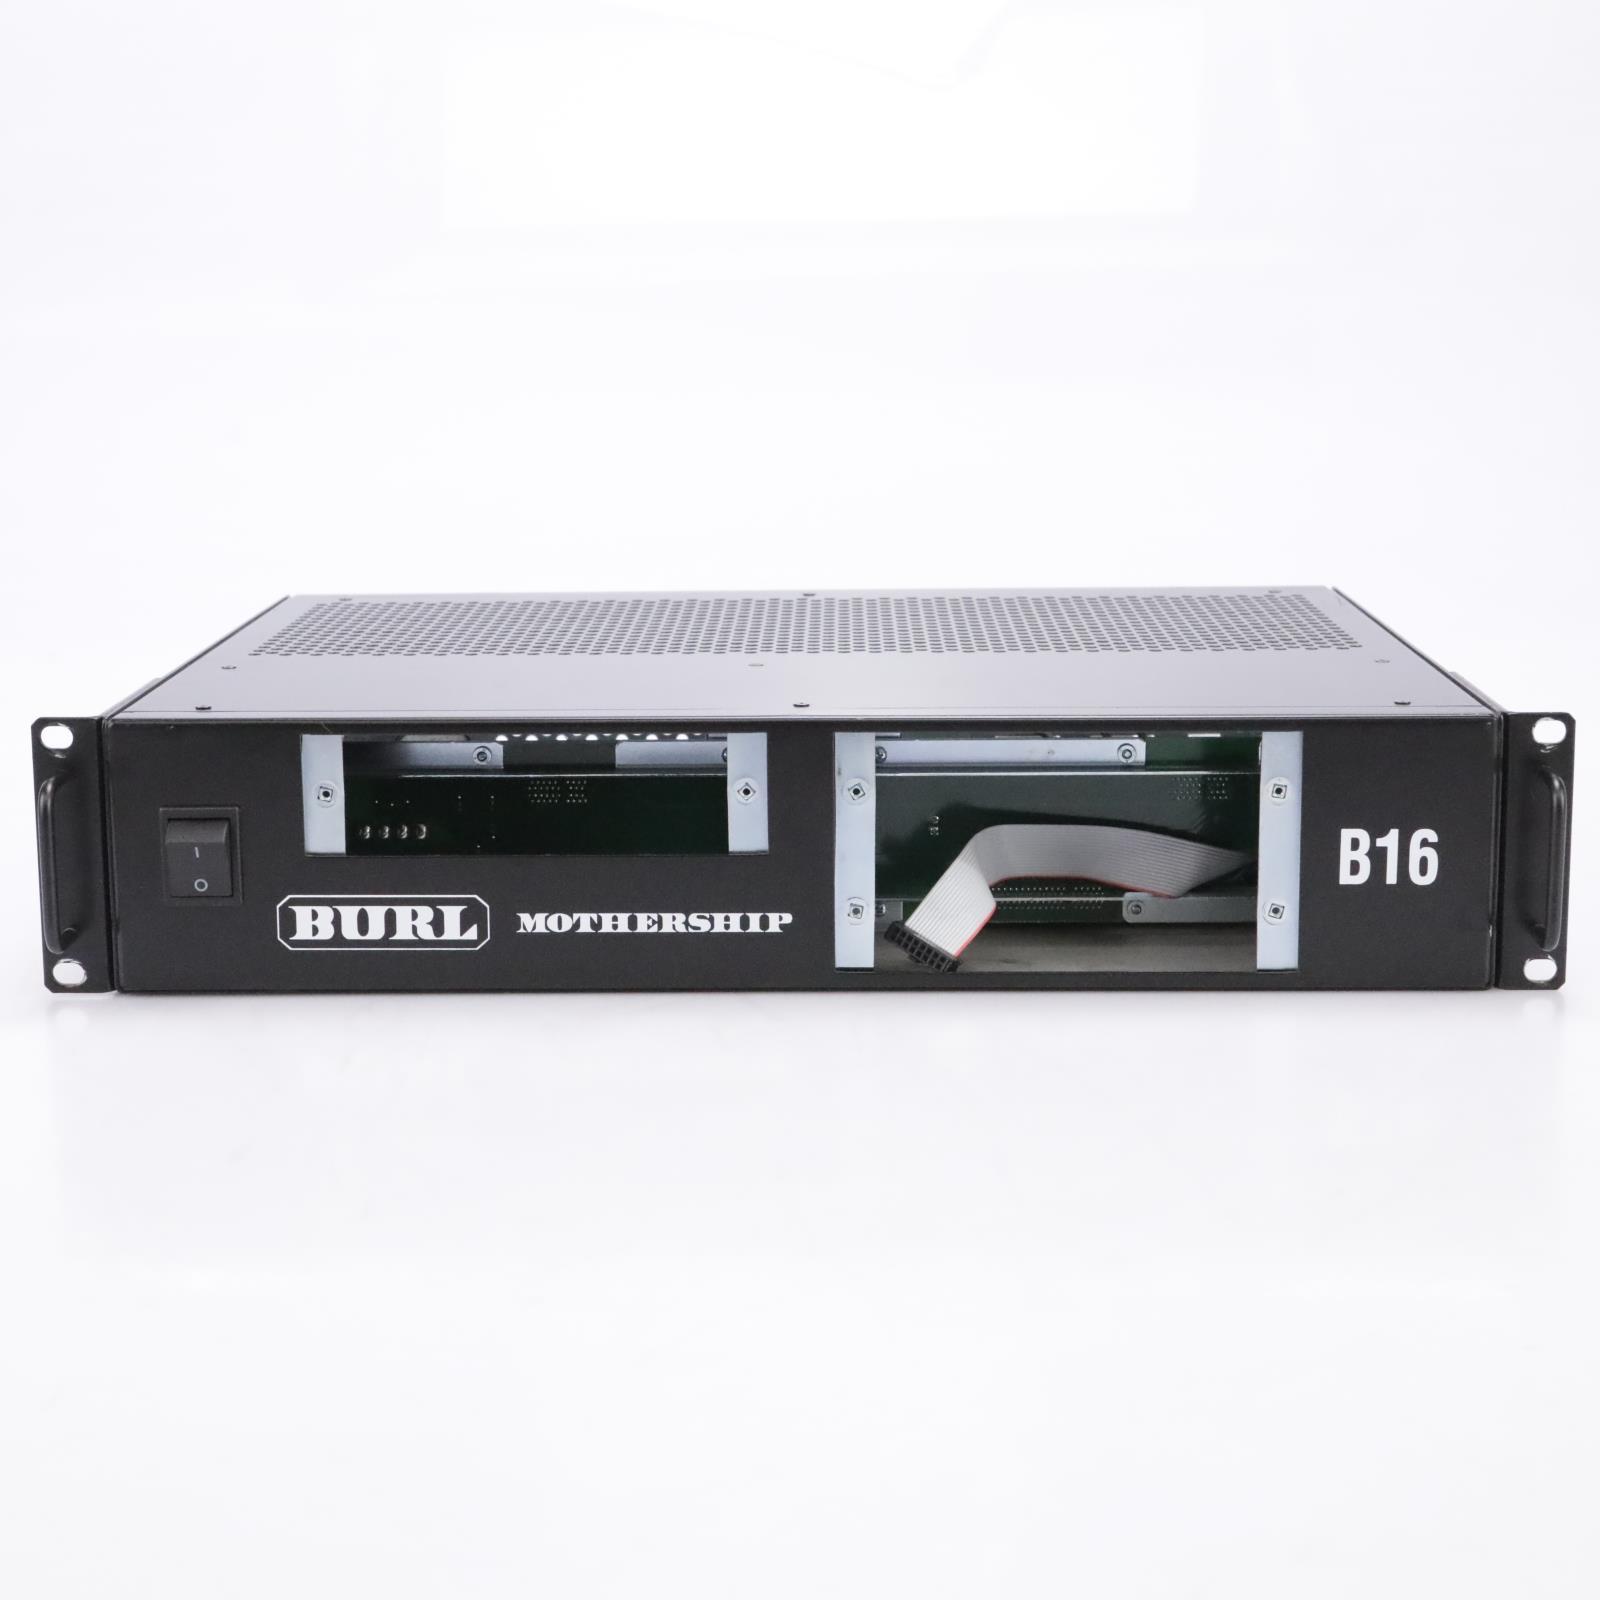 Burl Audio B16 Mothership Audio Interface Motherboard #43926